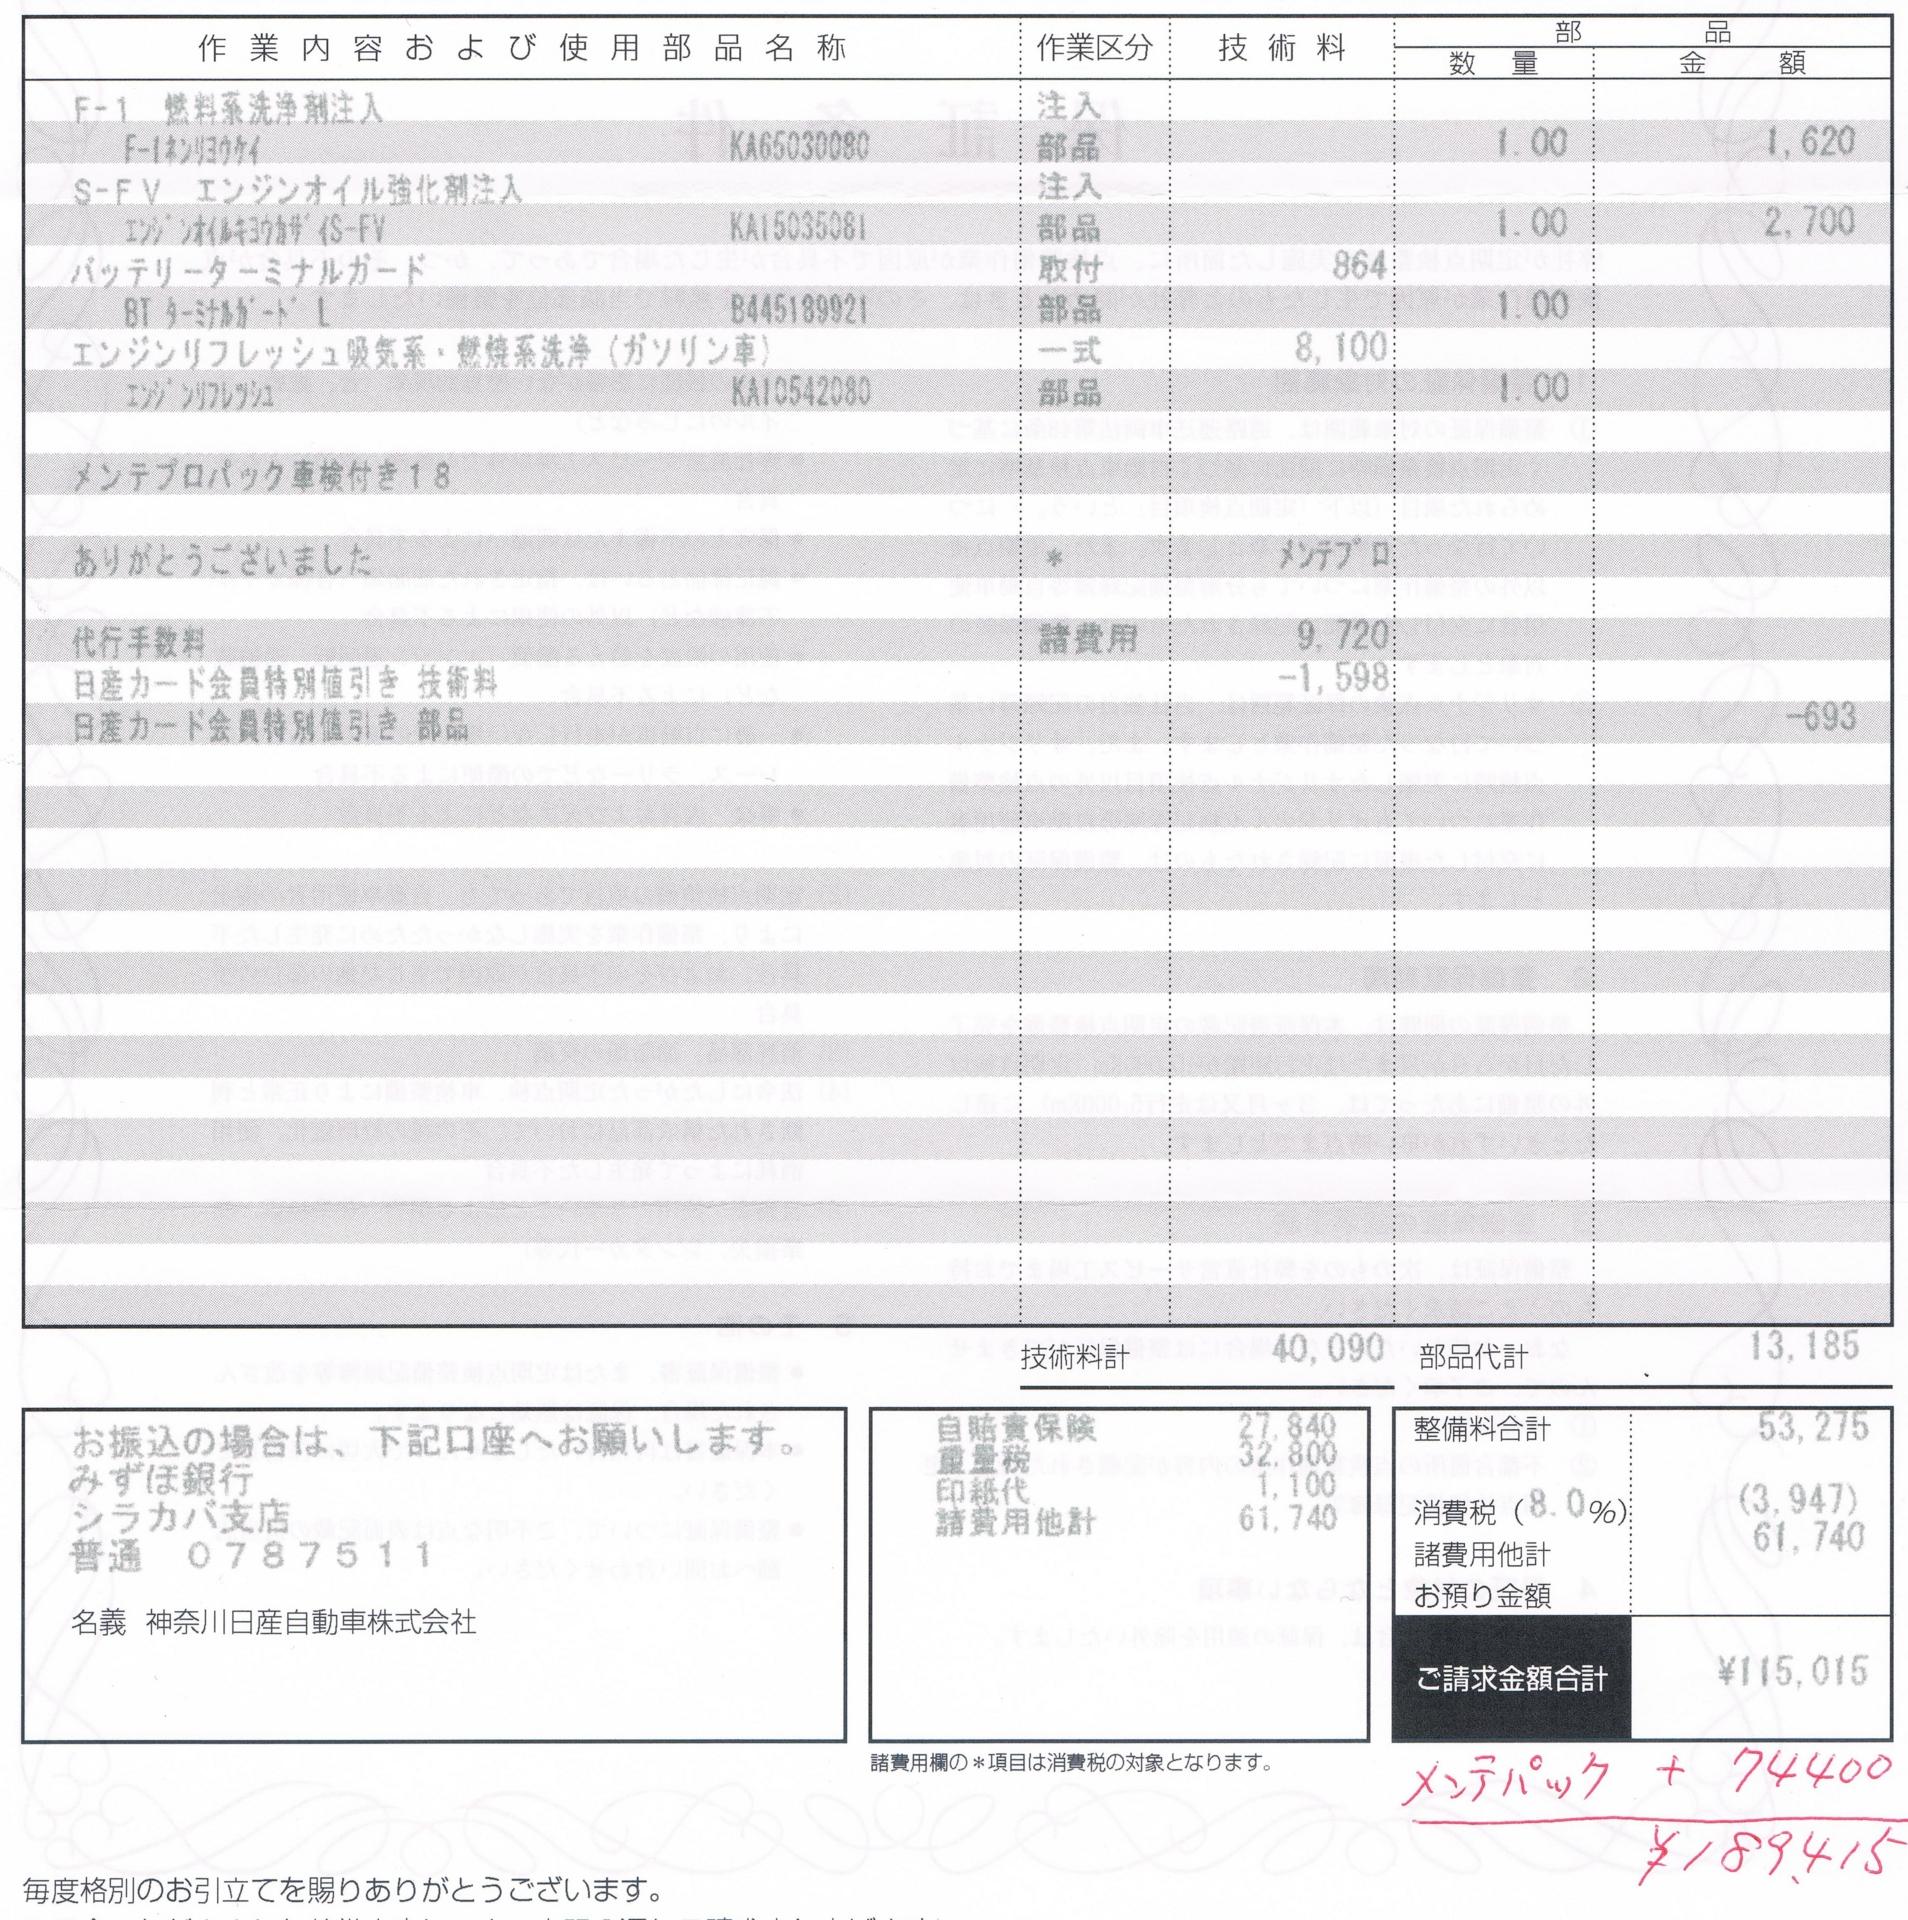 f:id:ToshUeno:20141019200842j:plain